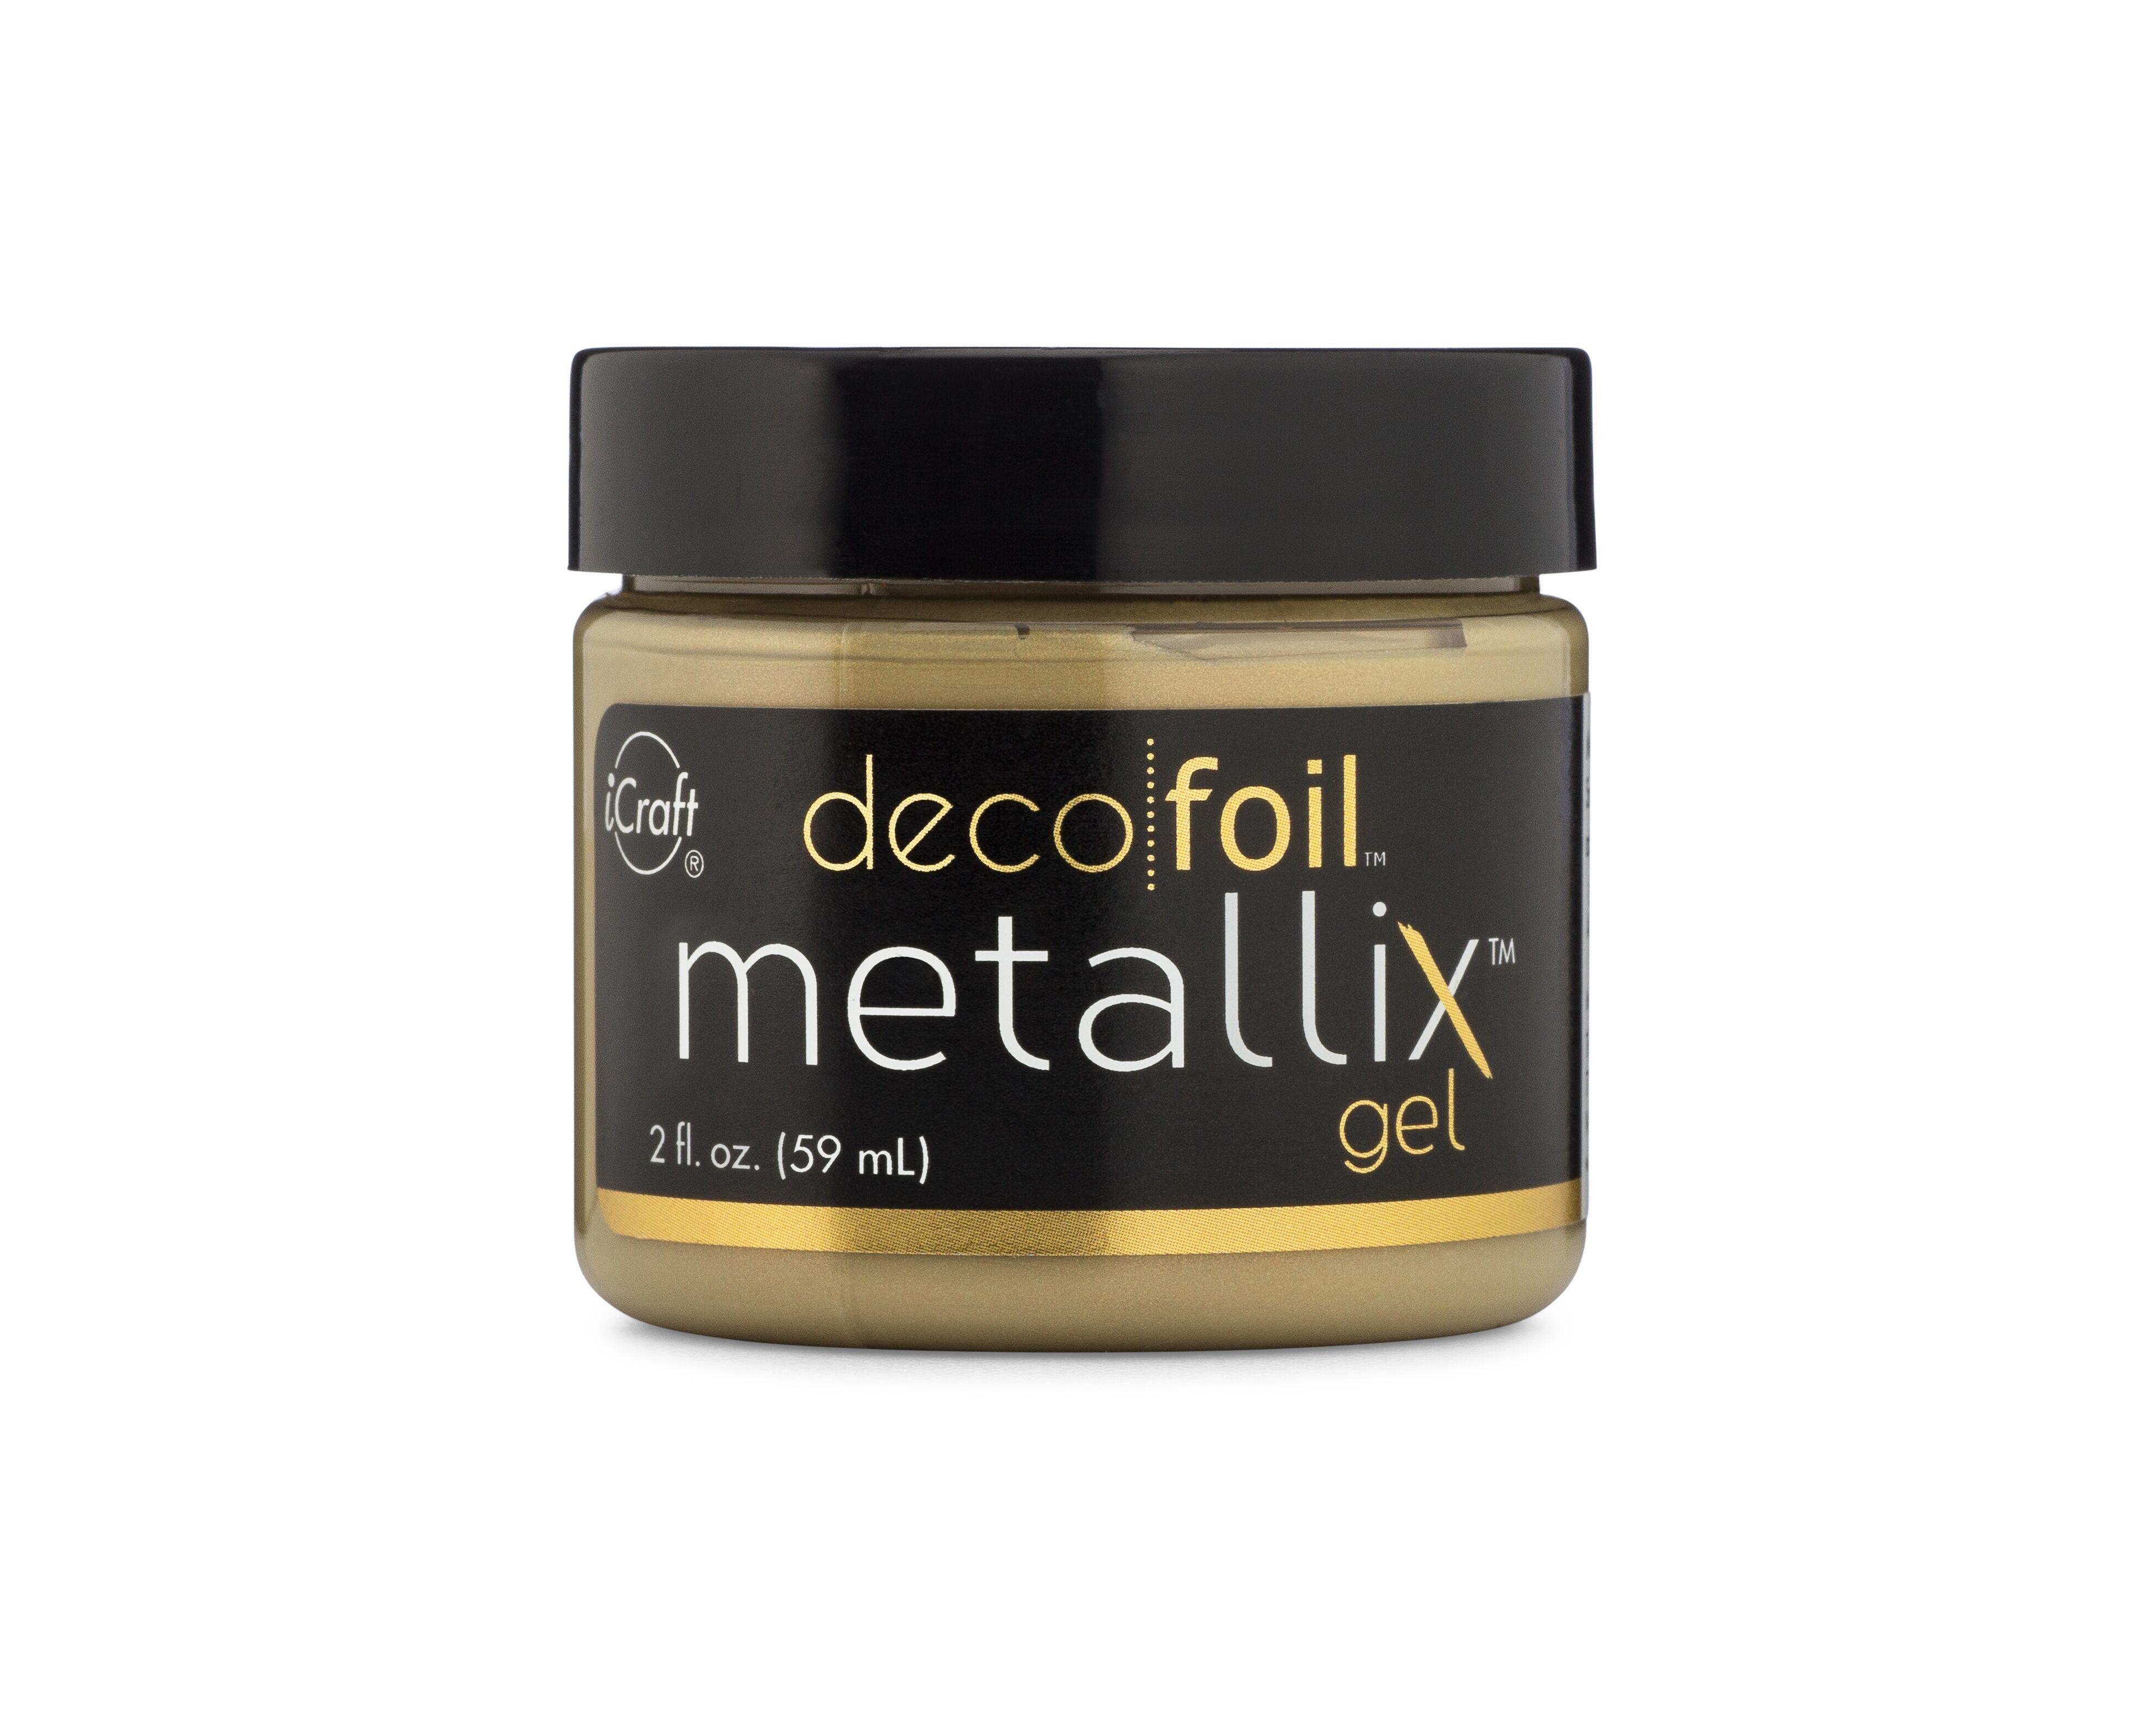 Deco Foil Metallix Gel, Pure Gold (2 fl oz)